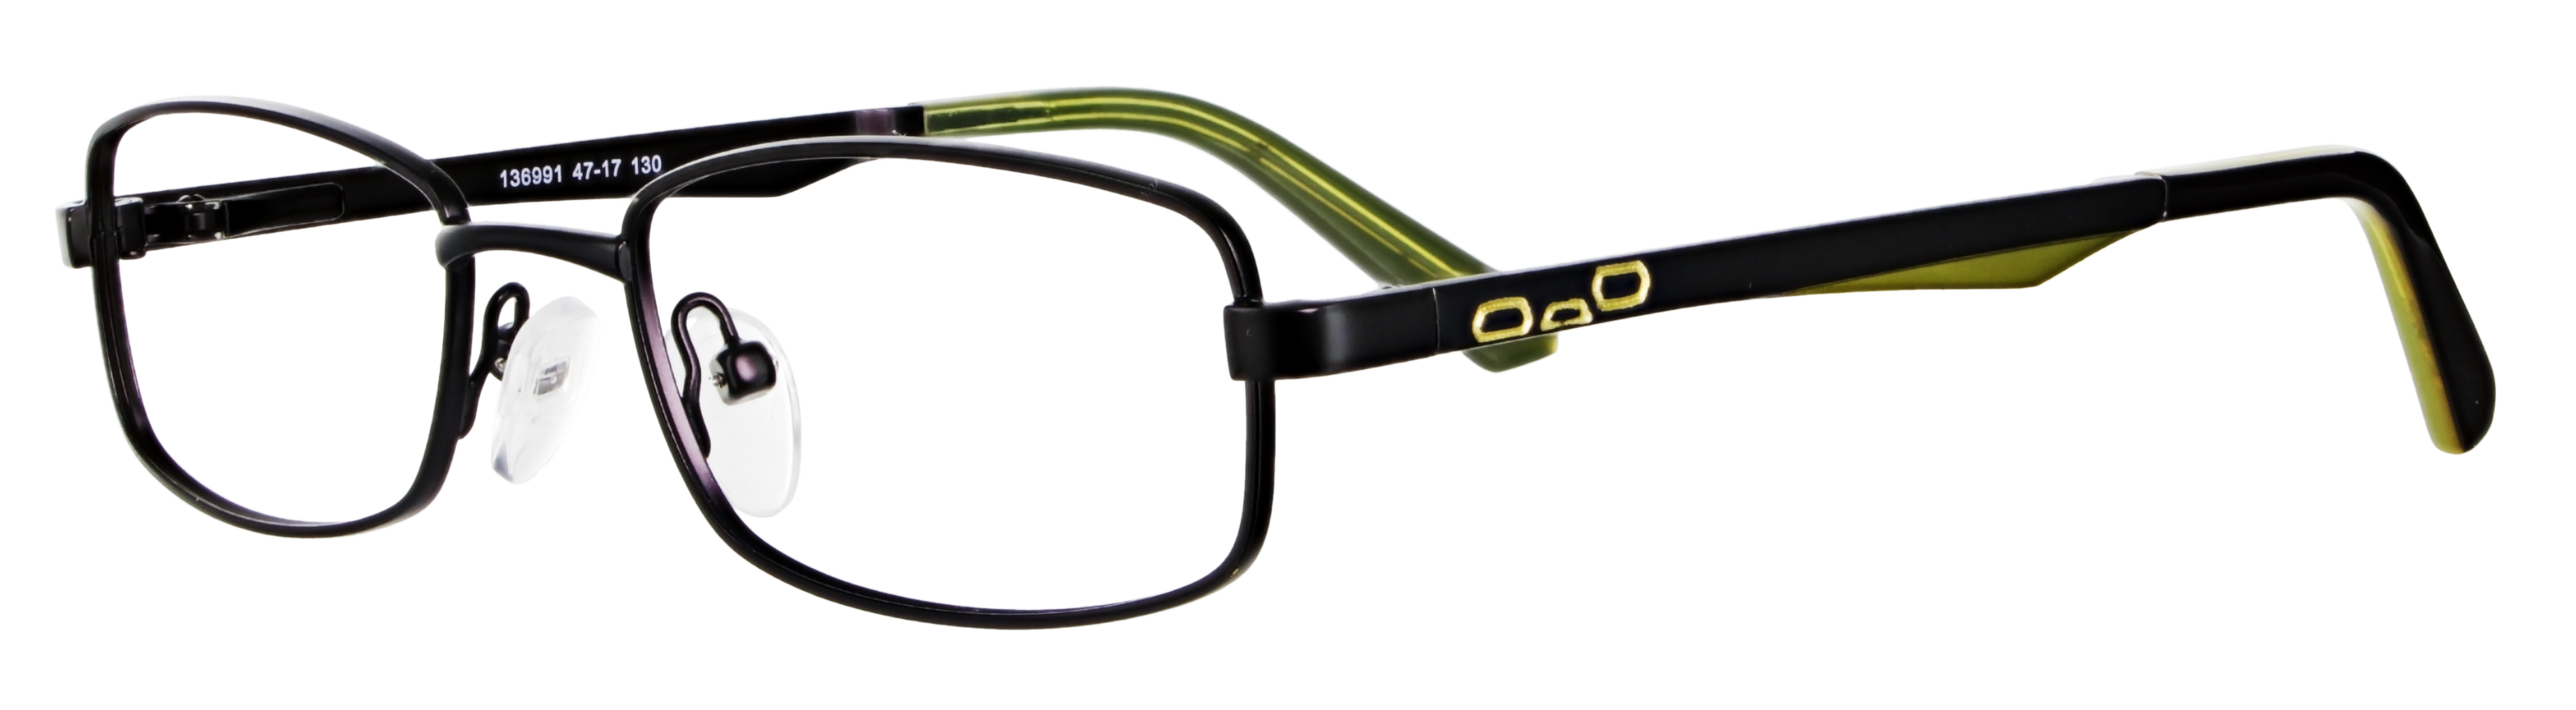 abele optik Kinderbrille 136991